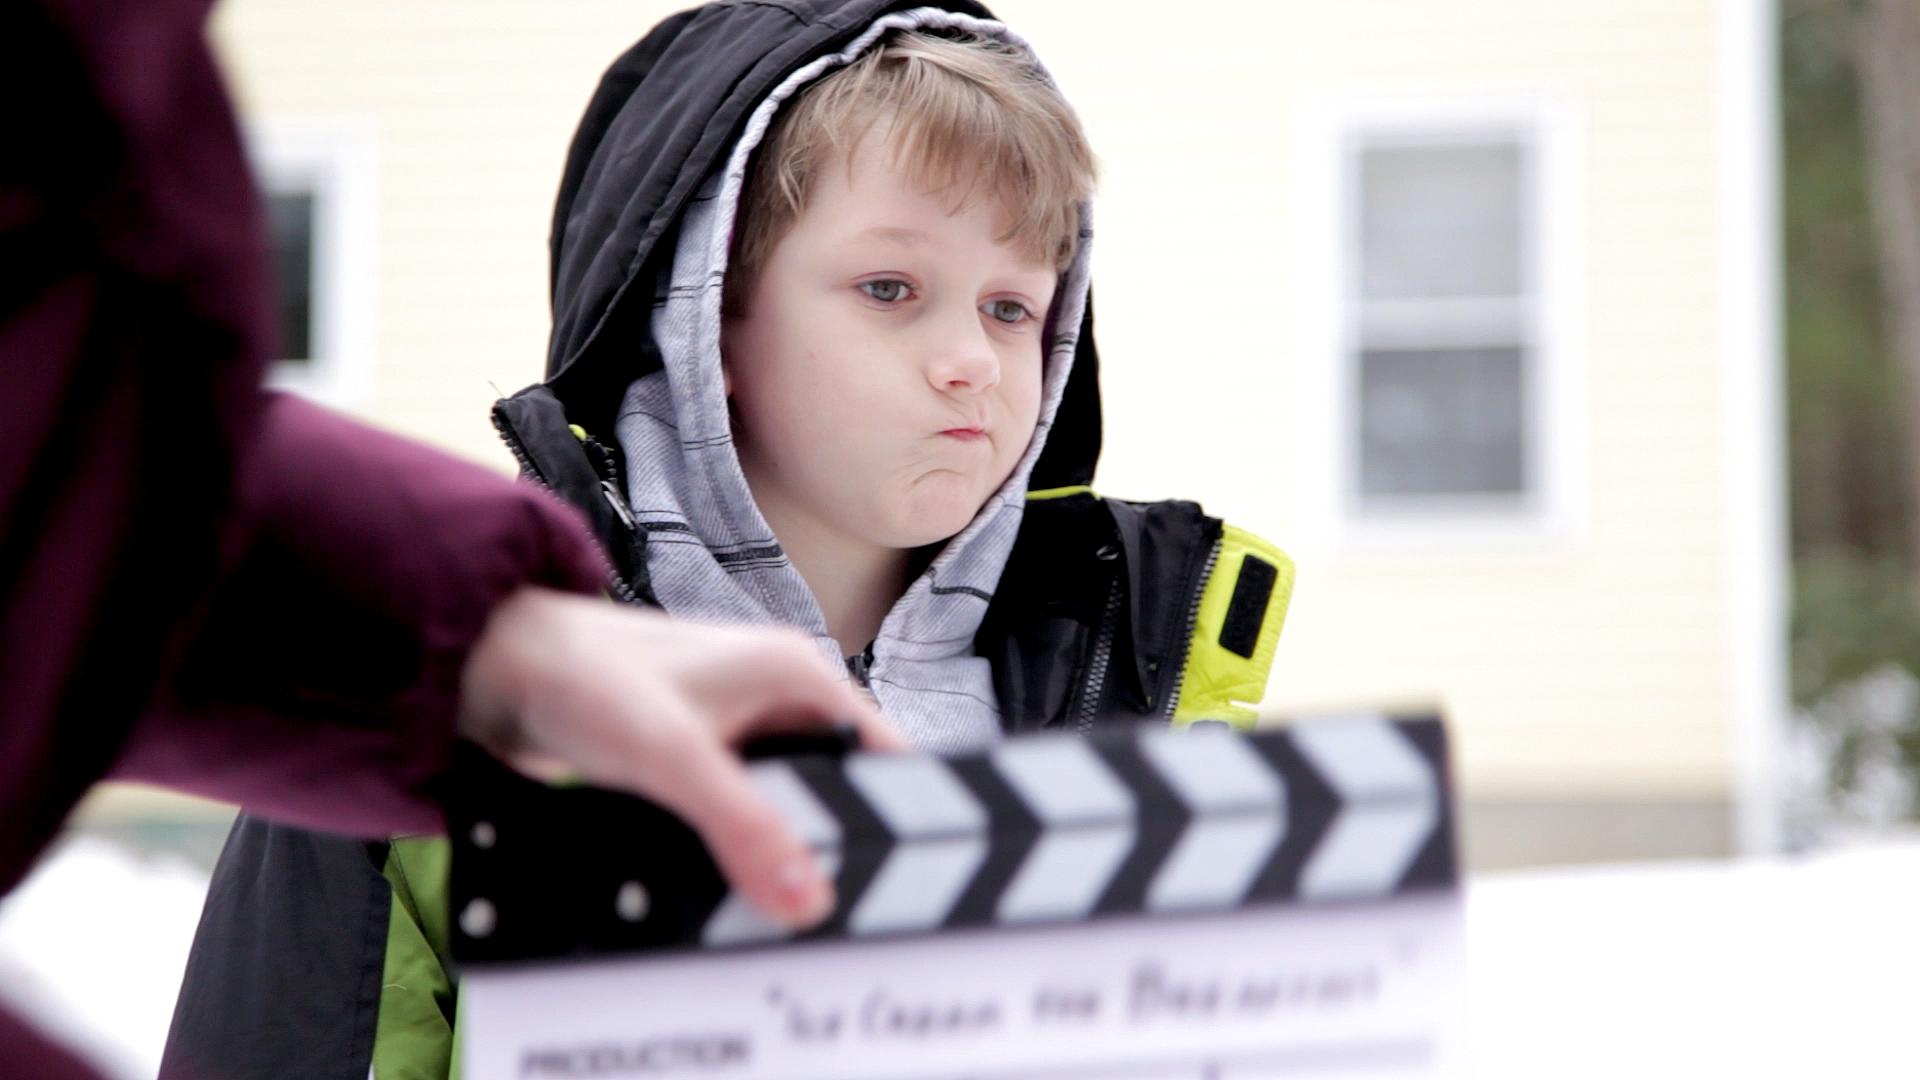 Charlie Tacker in Geena Matuson's (@geenamatuson) short film 'Ice Cream for Breakfast' (2013).